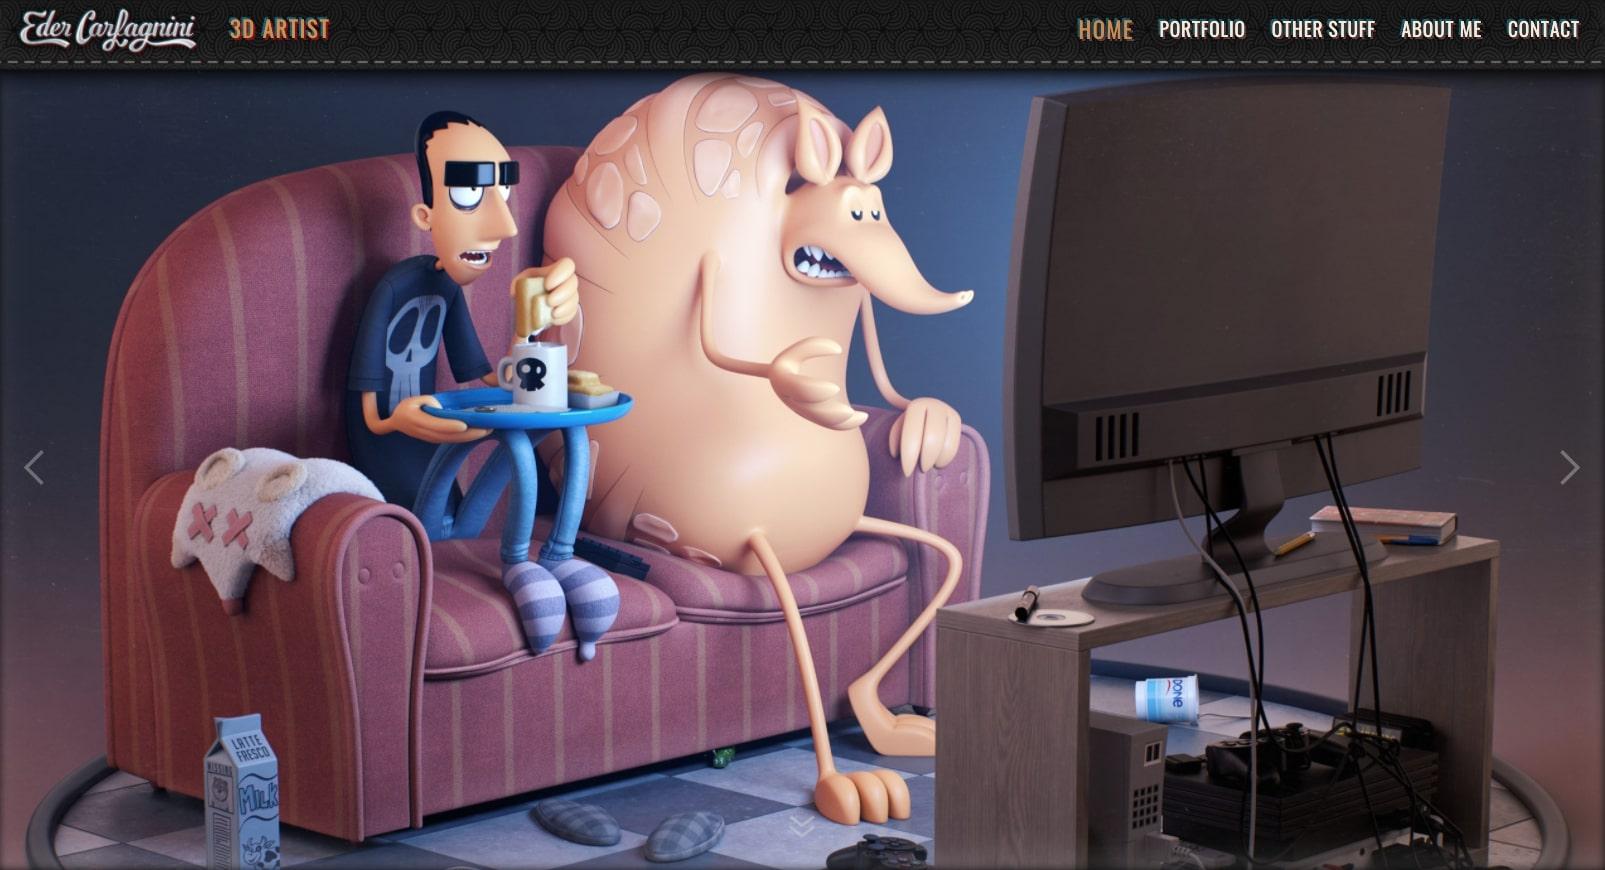 eder's online portfolio